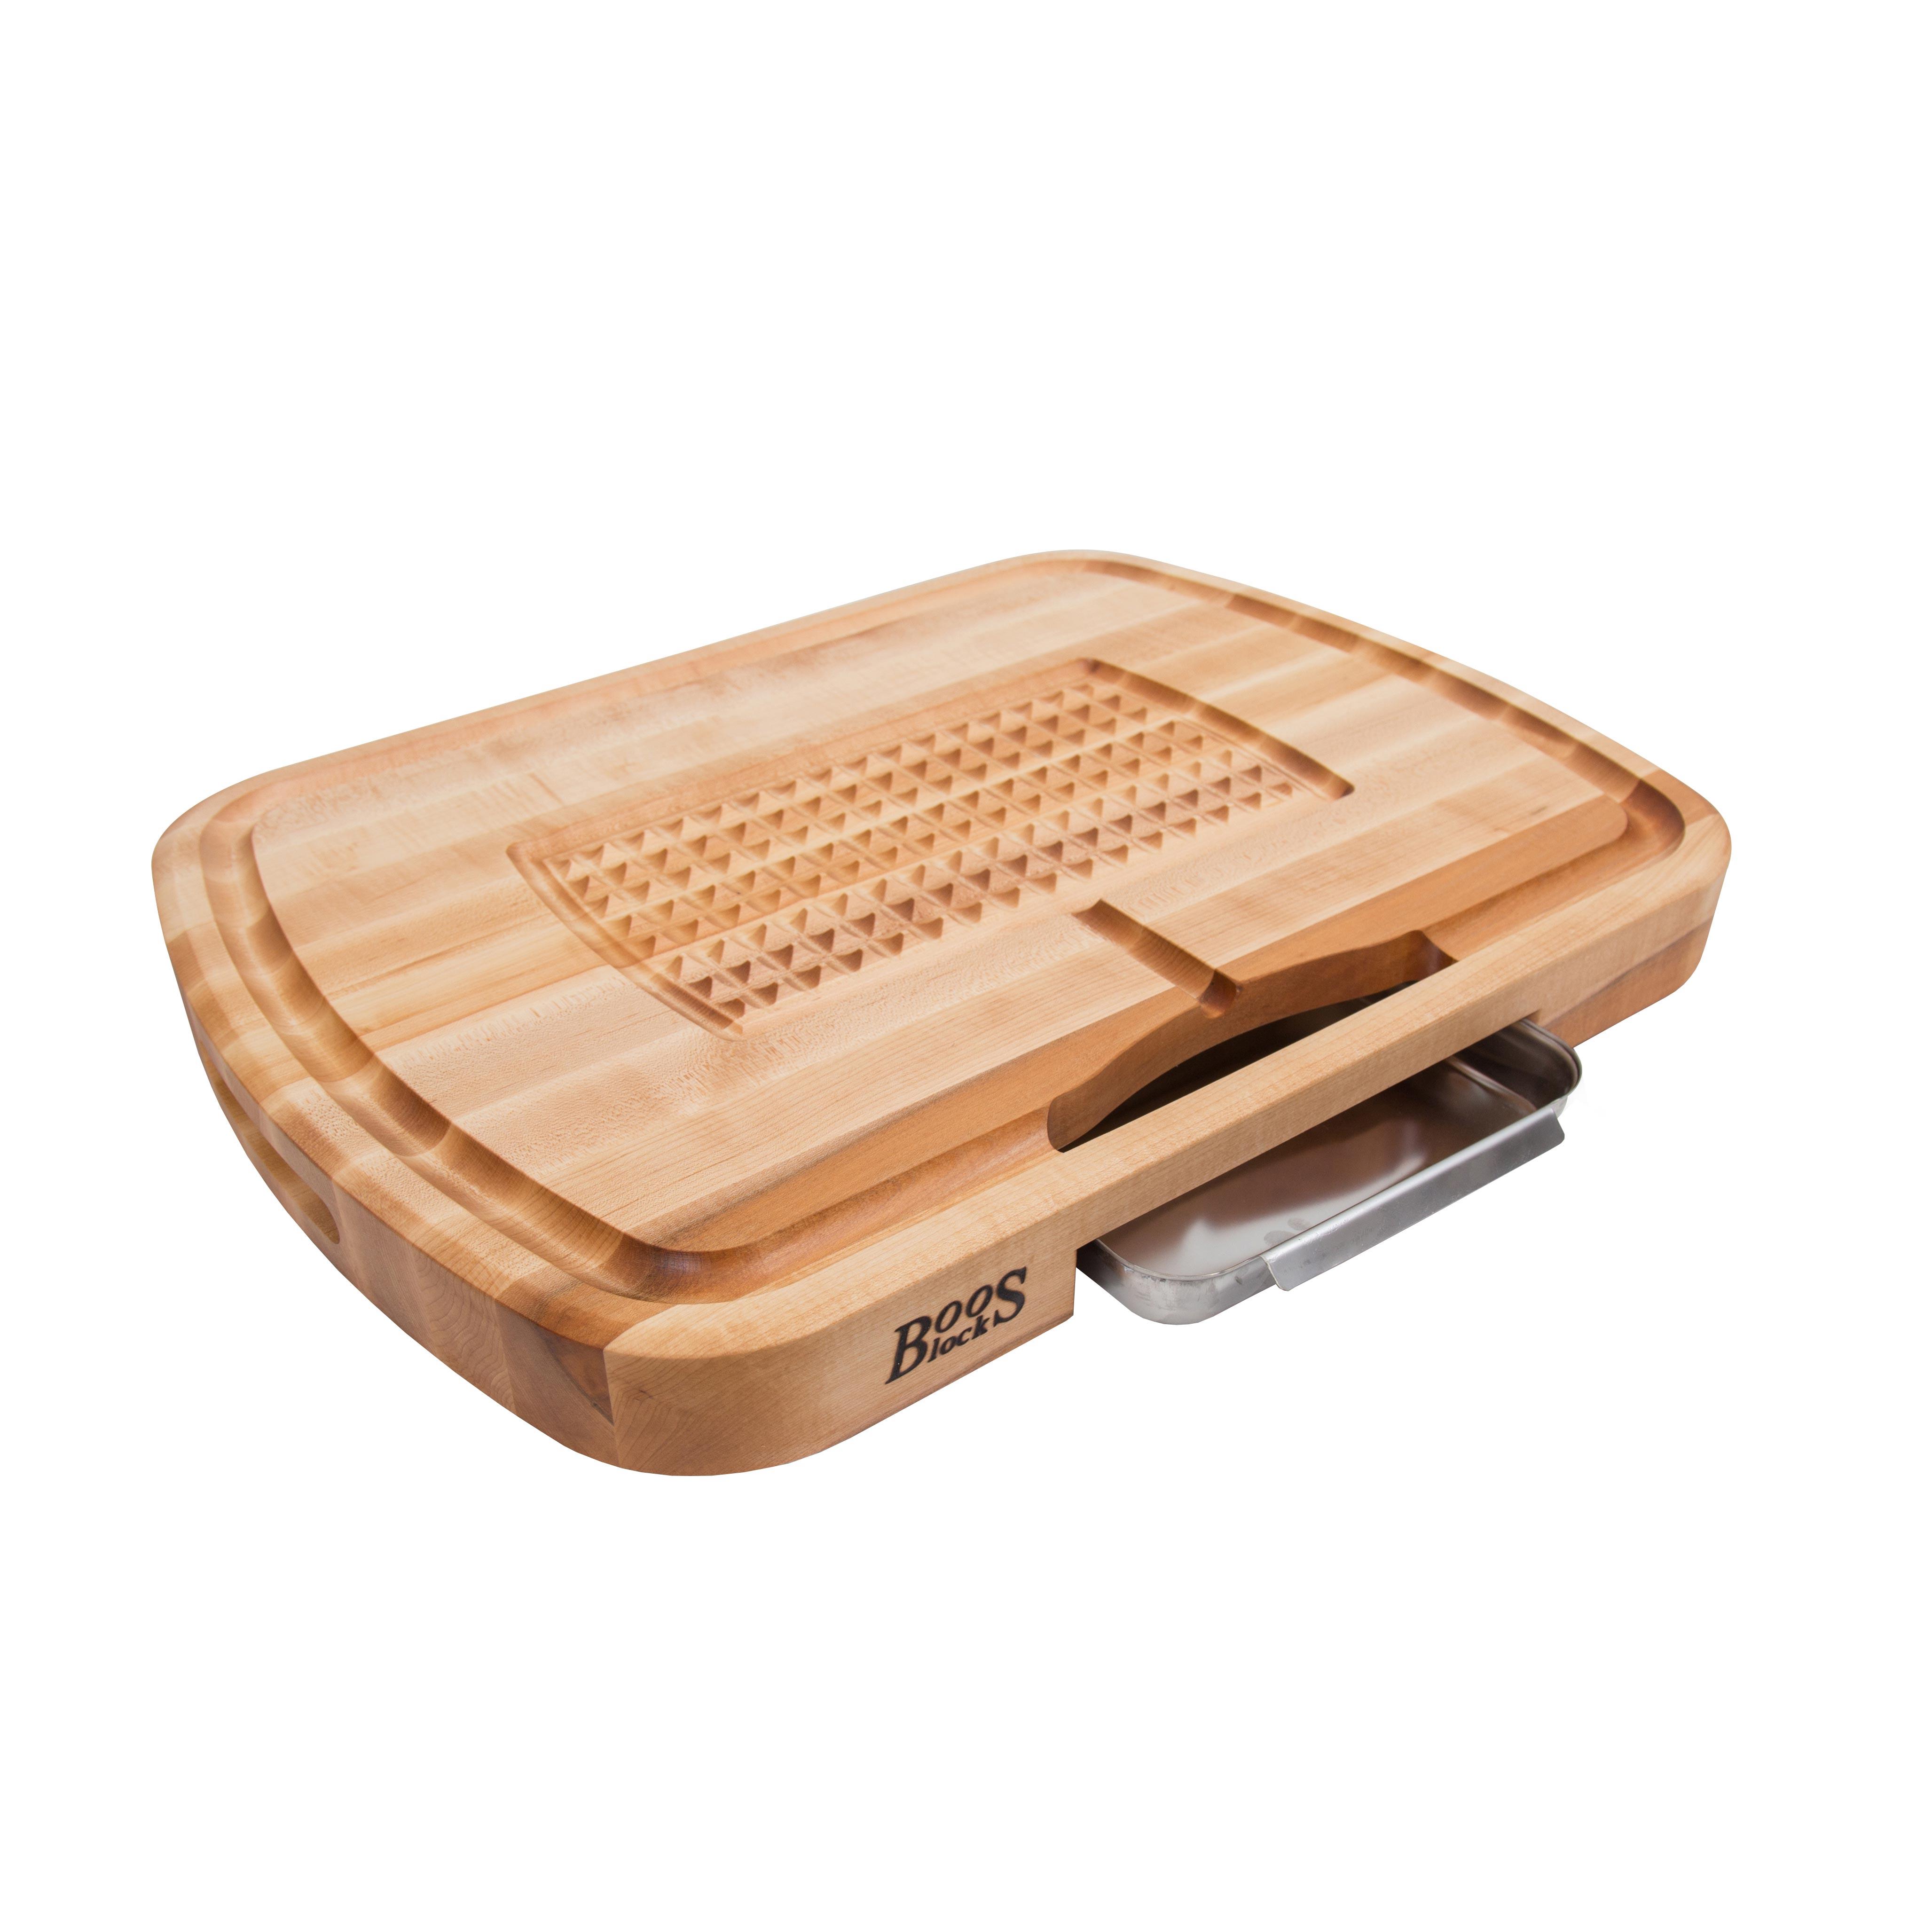 John Boos CB1053-1M2418225 cutting board, wood